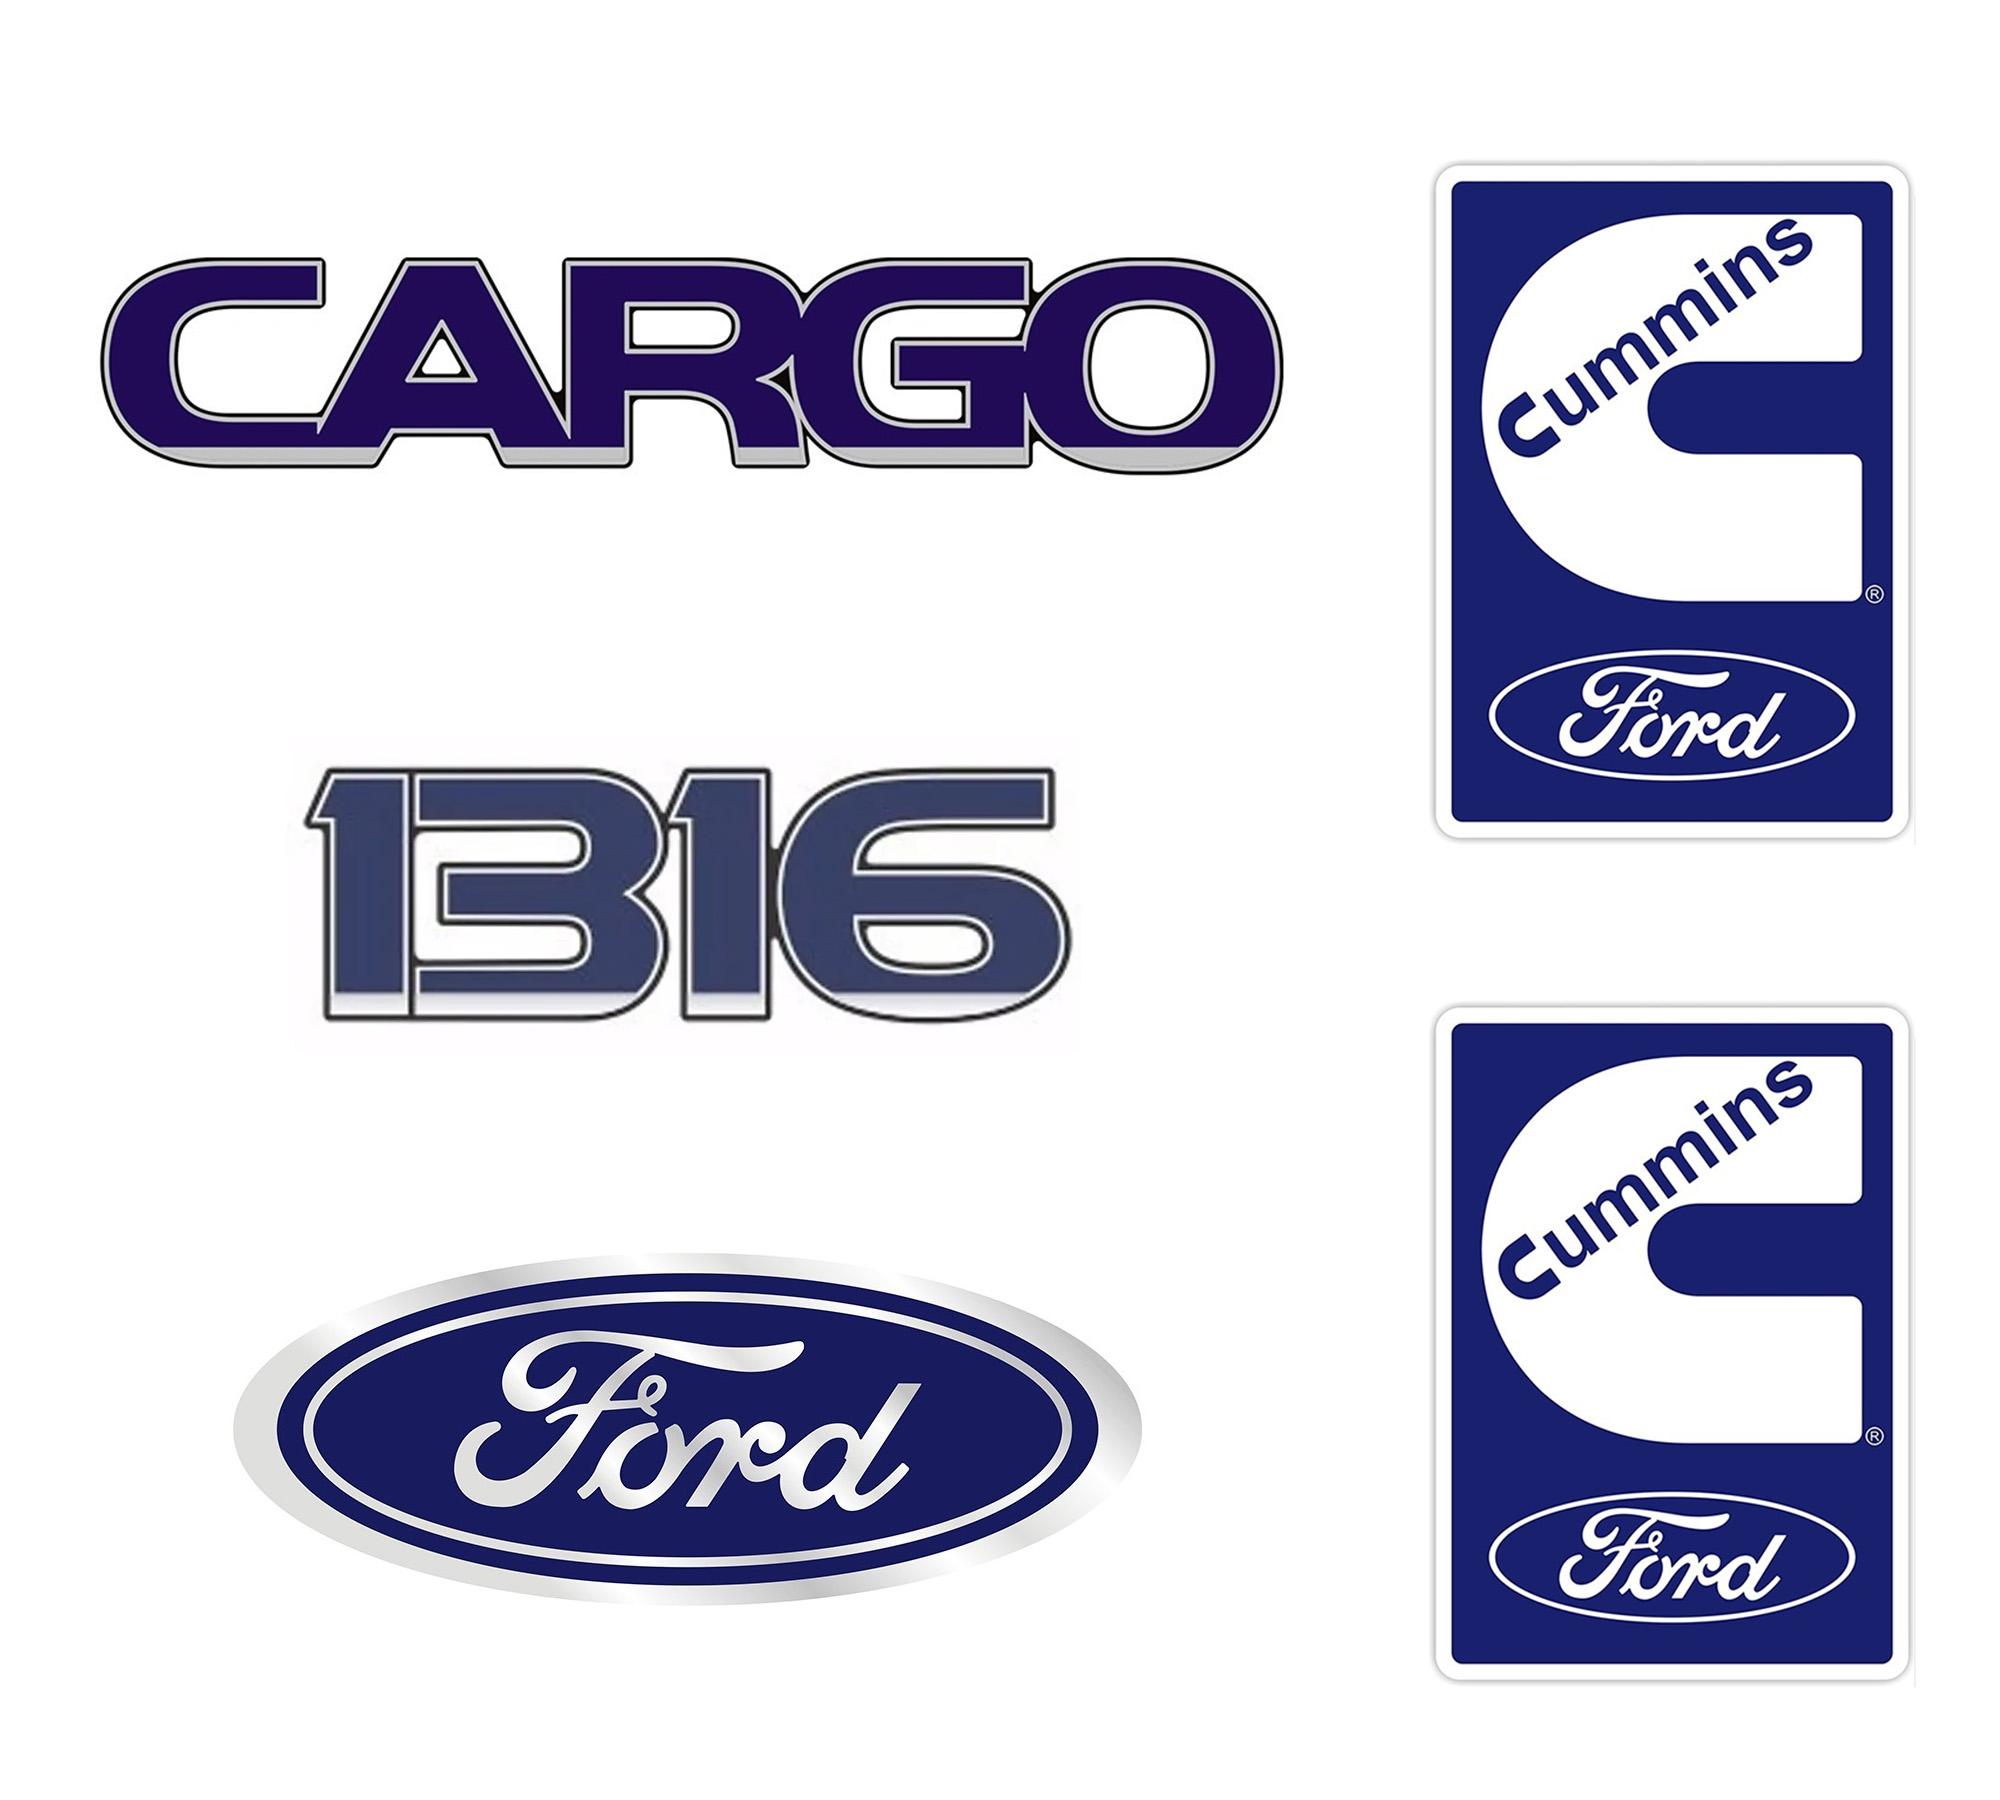 Emblema Ford Cargo 1316 Cummins - Kit